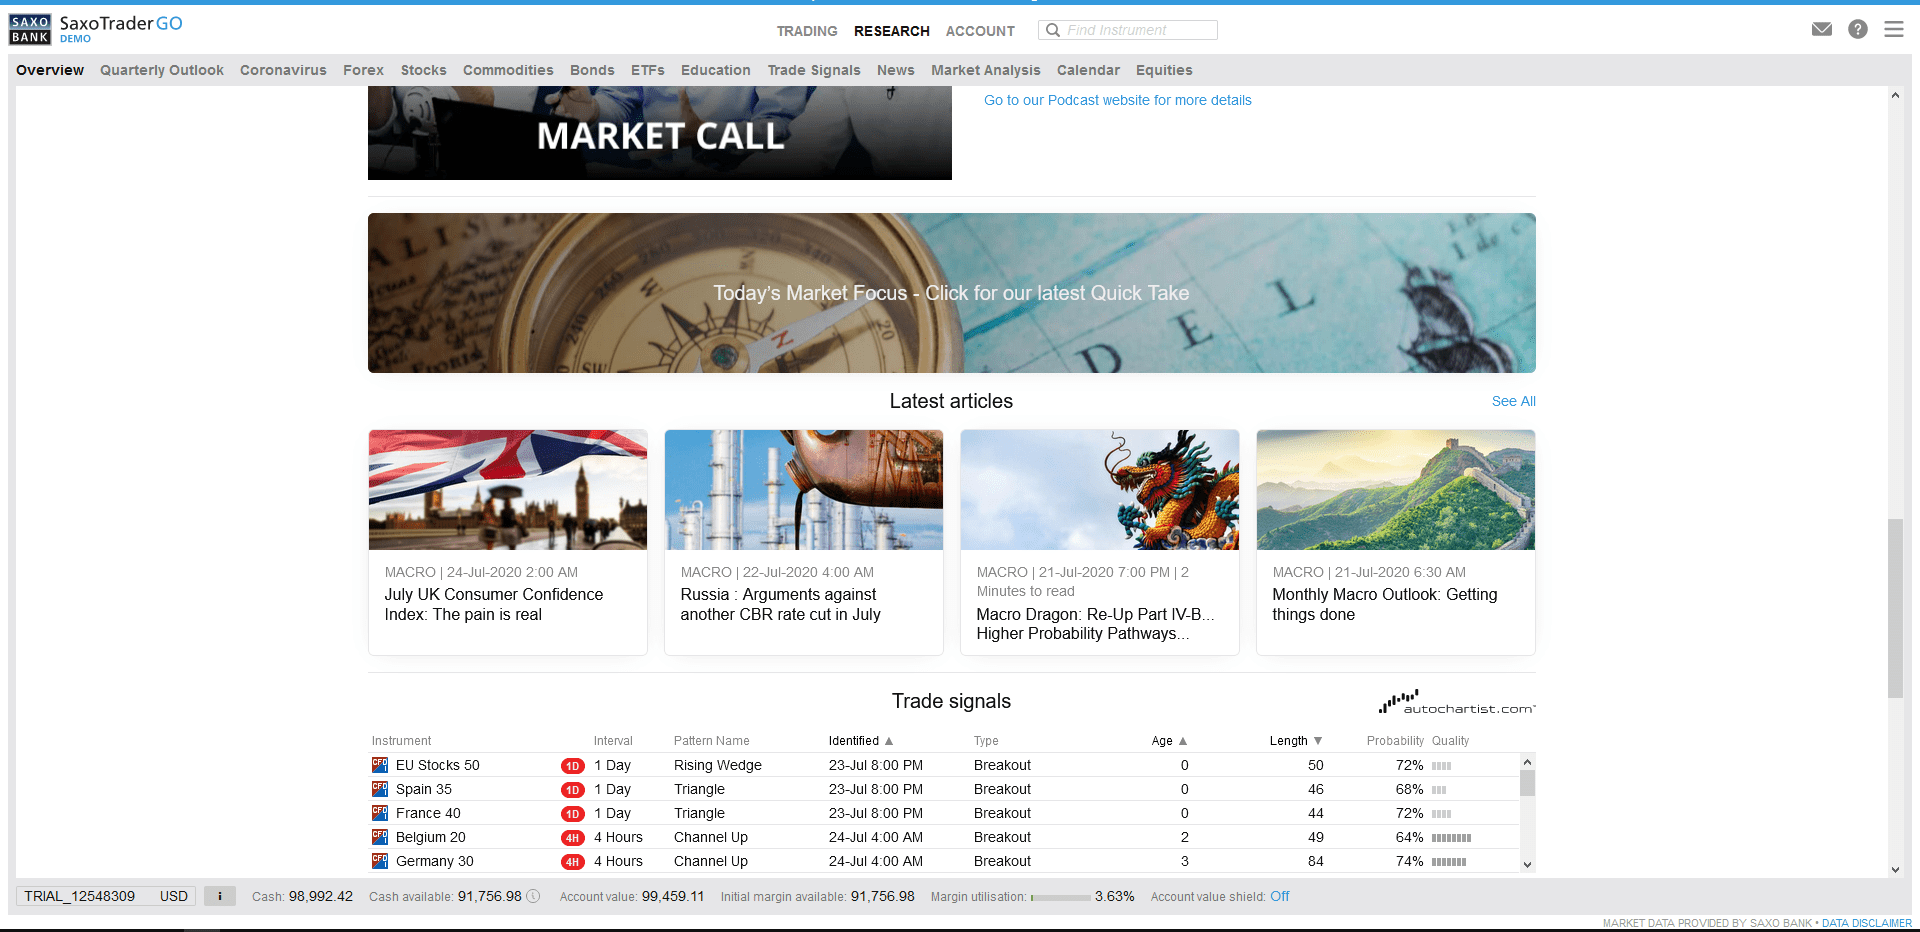 SaxoTraderGO Market Analysis